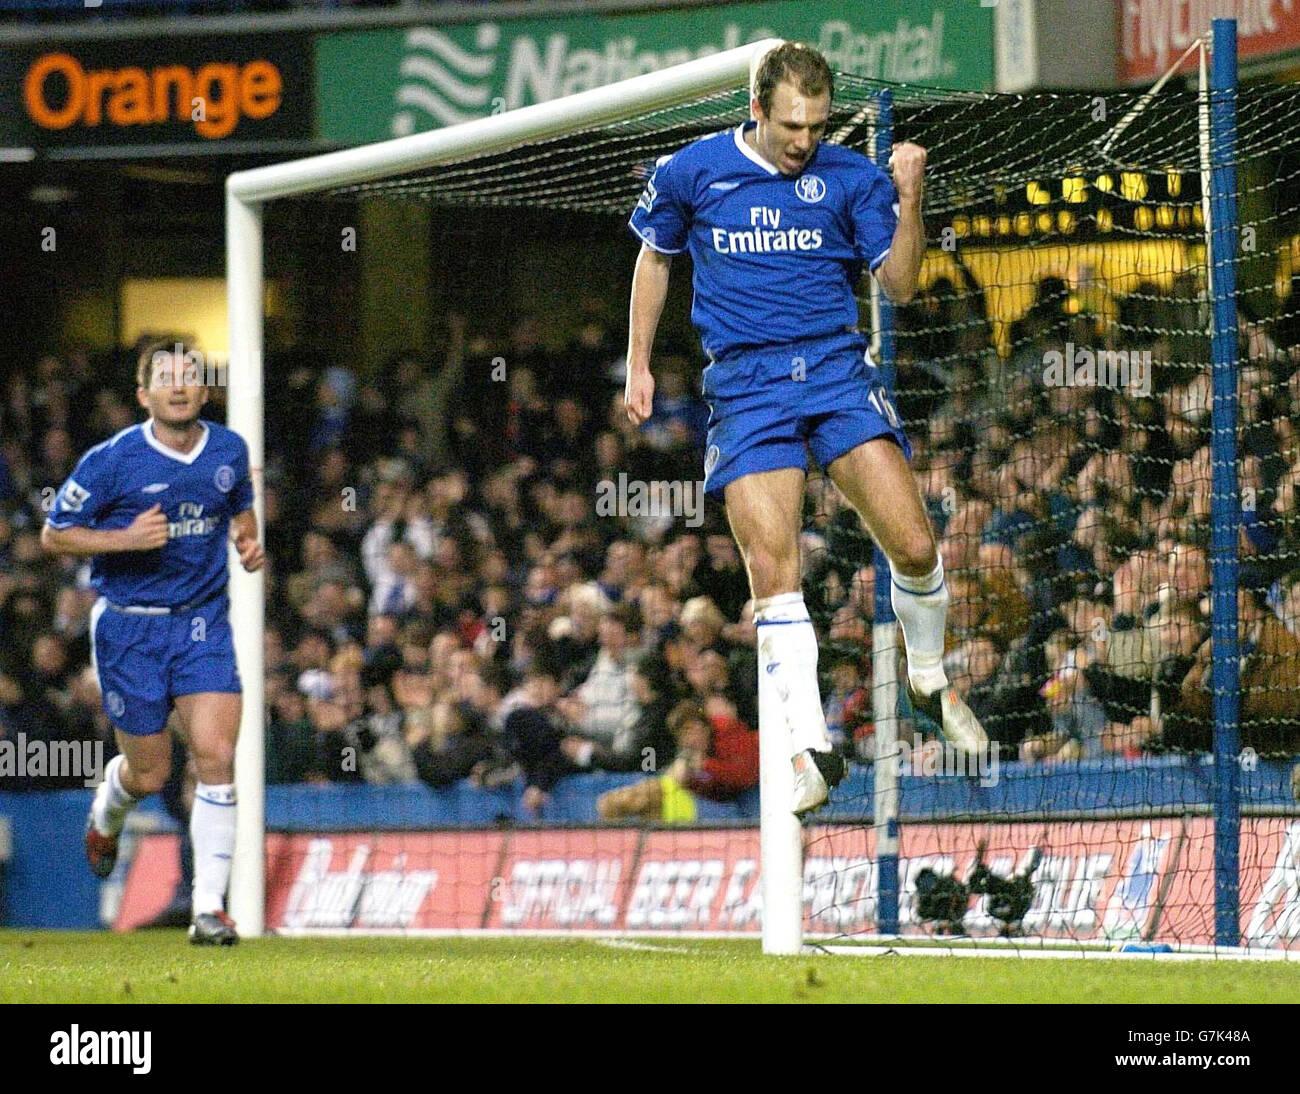 Chelsea v Norwich City - Stamford Bridge - Stock Image